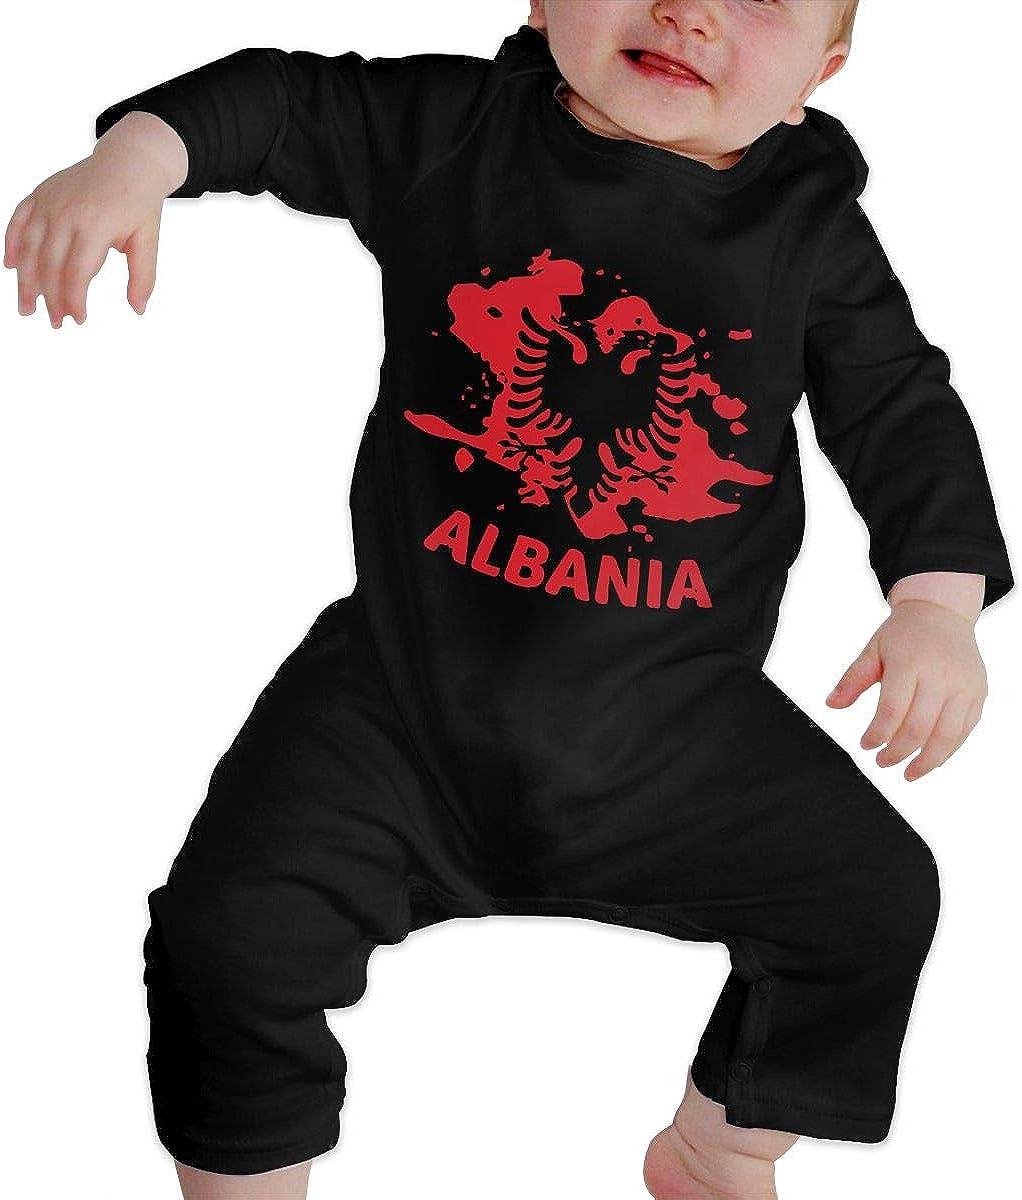 BKNGDG8Q Newborn Baby Boy Girl Romper Jumpsuit Albanian Flag Albania Organic One-Piece Kid Pajamas Clothes